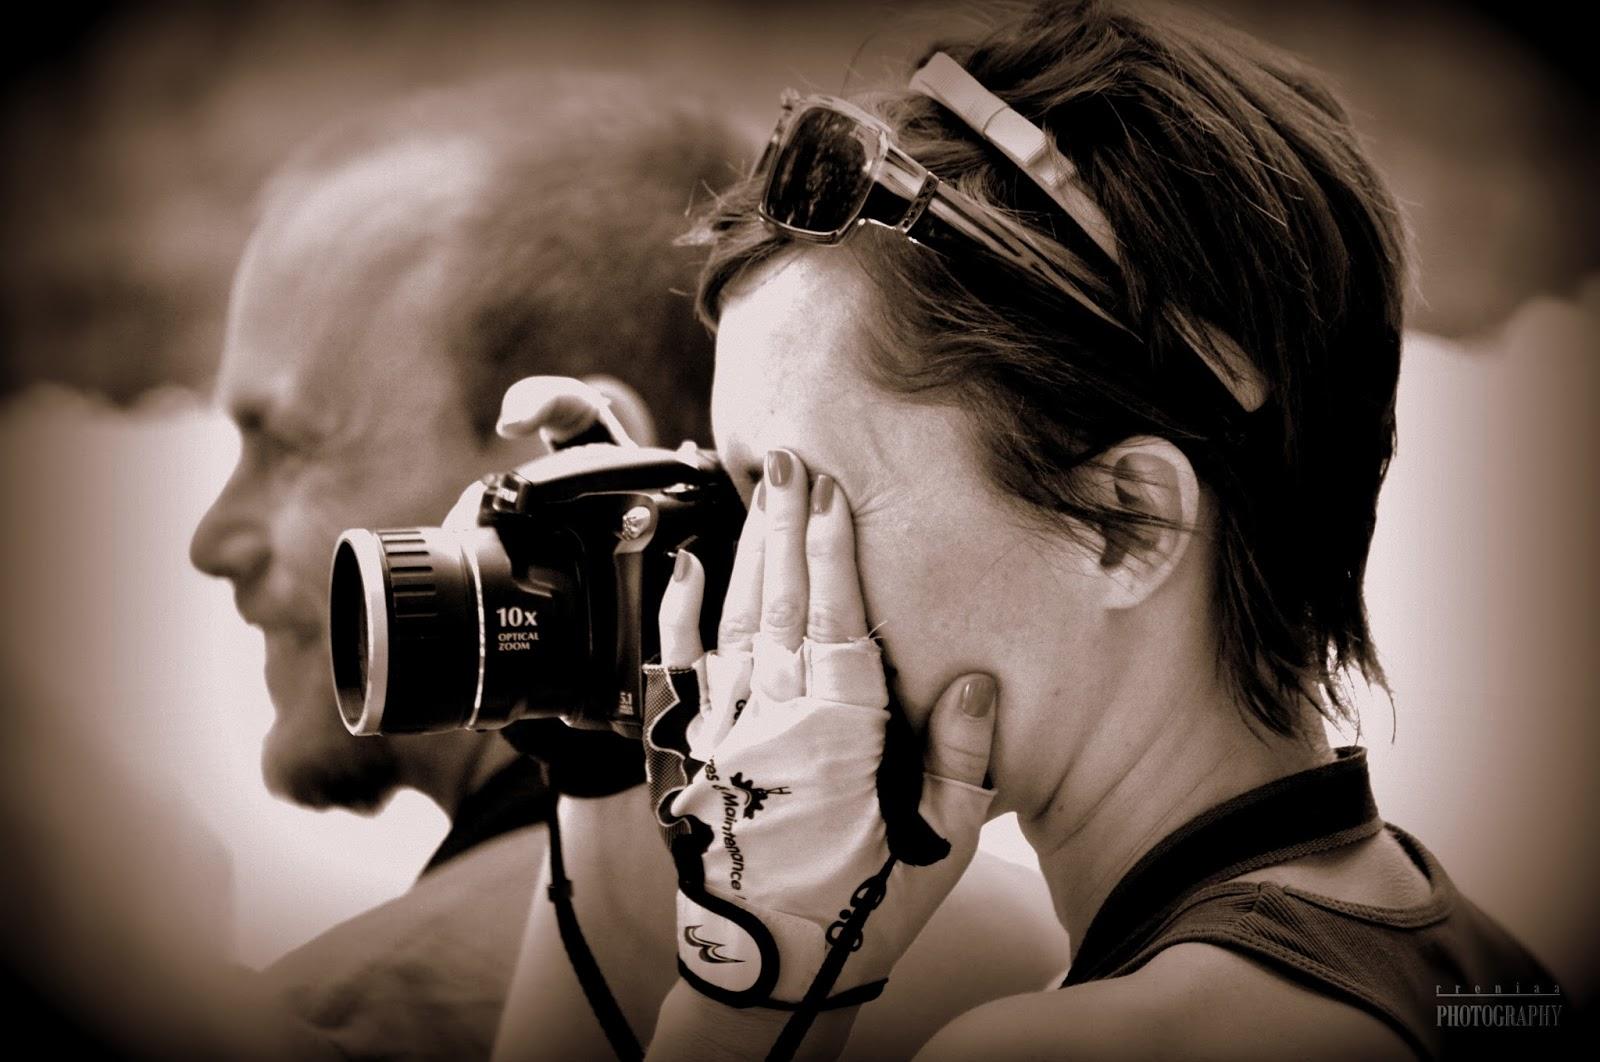 rreniaaphotography.blogspot.com